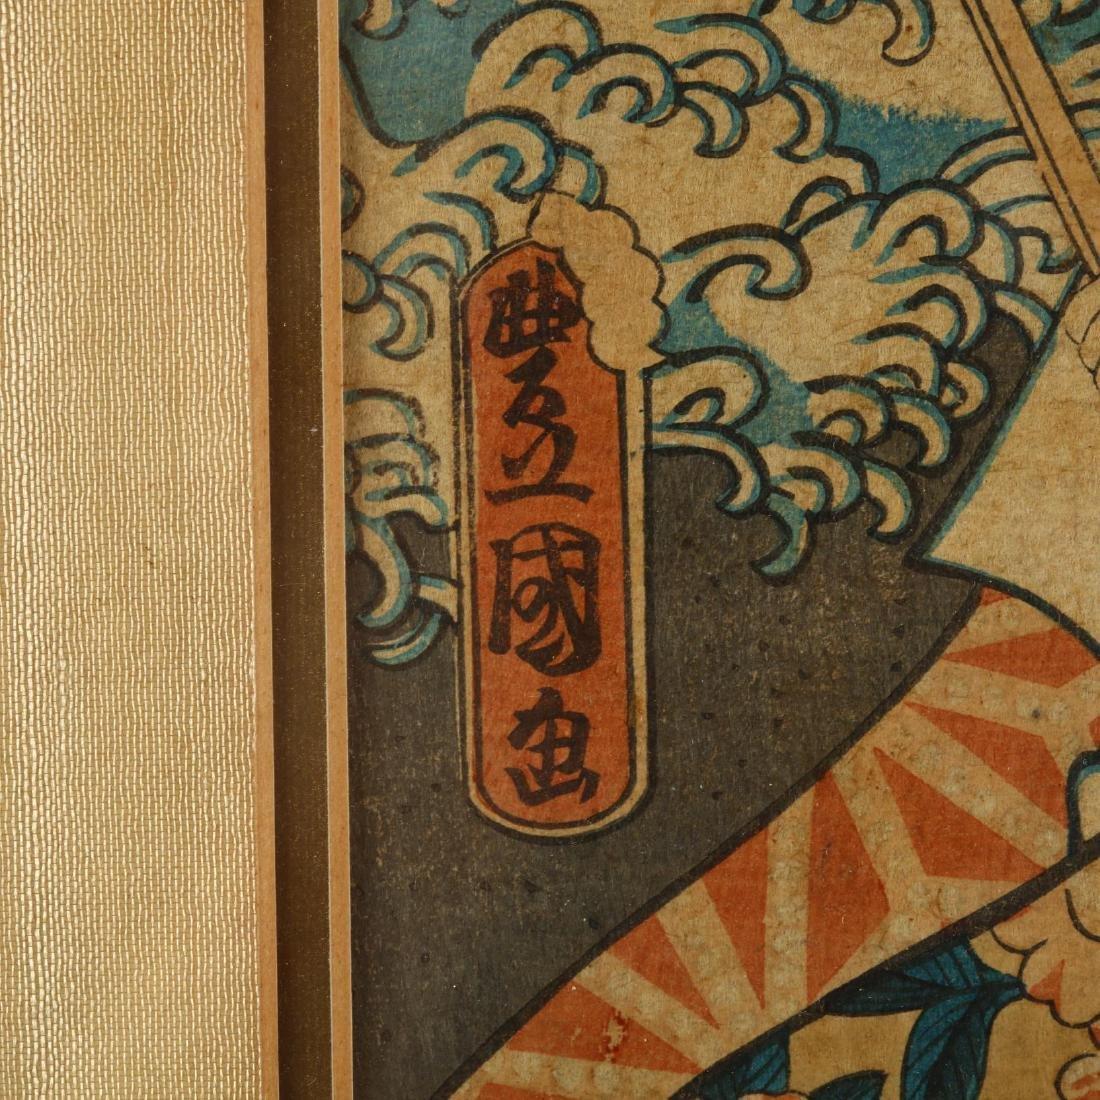 Two Japanese Woodblock Prints by Kunisada and Kuniyoshi - 9